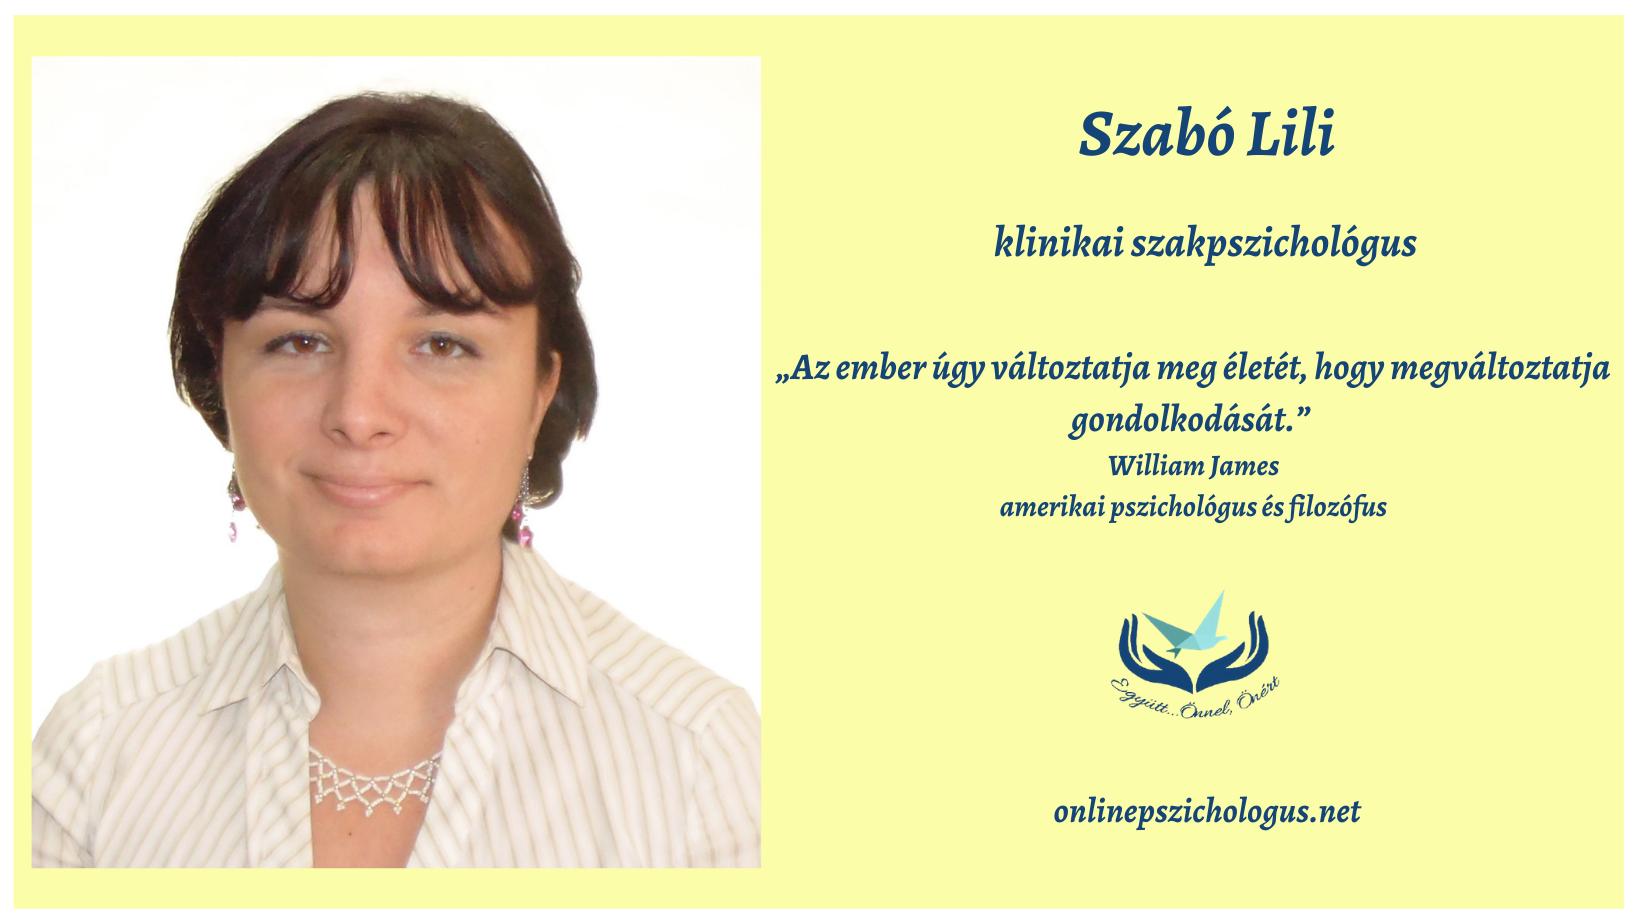 Interjú Szabó Lili klinikai szakpszichológussal